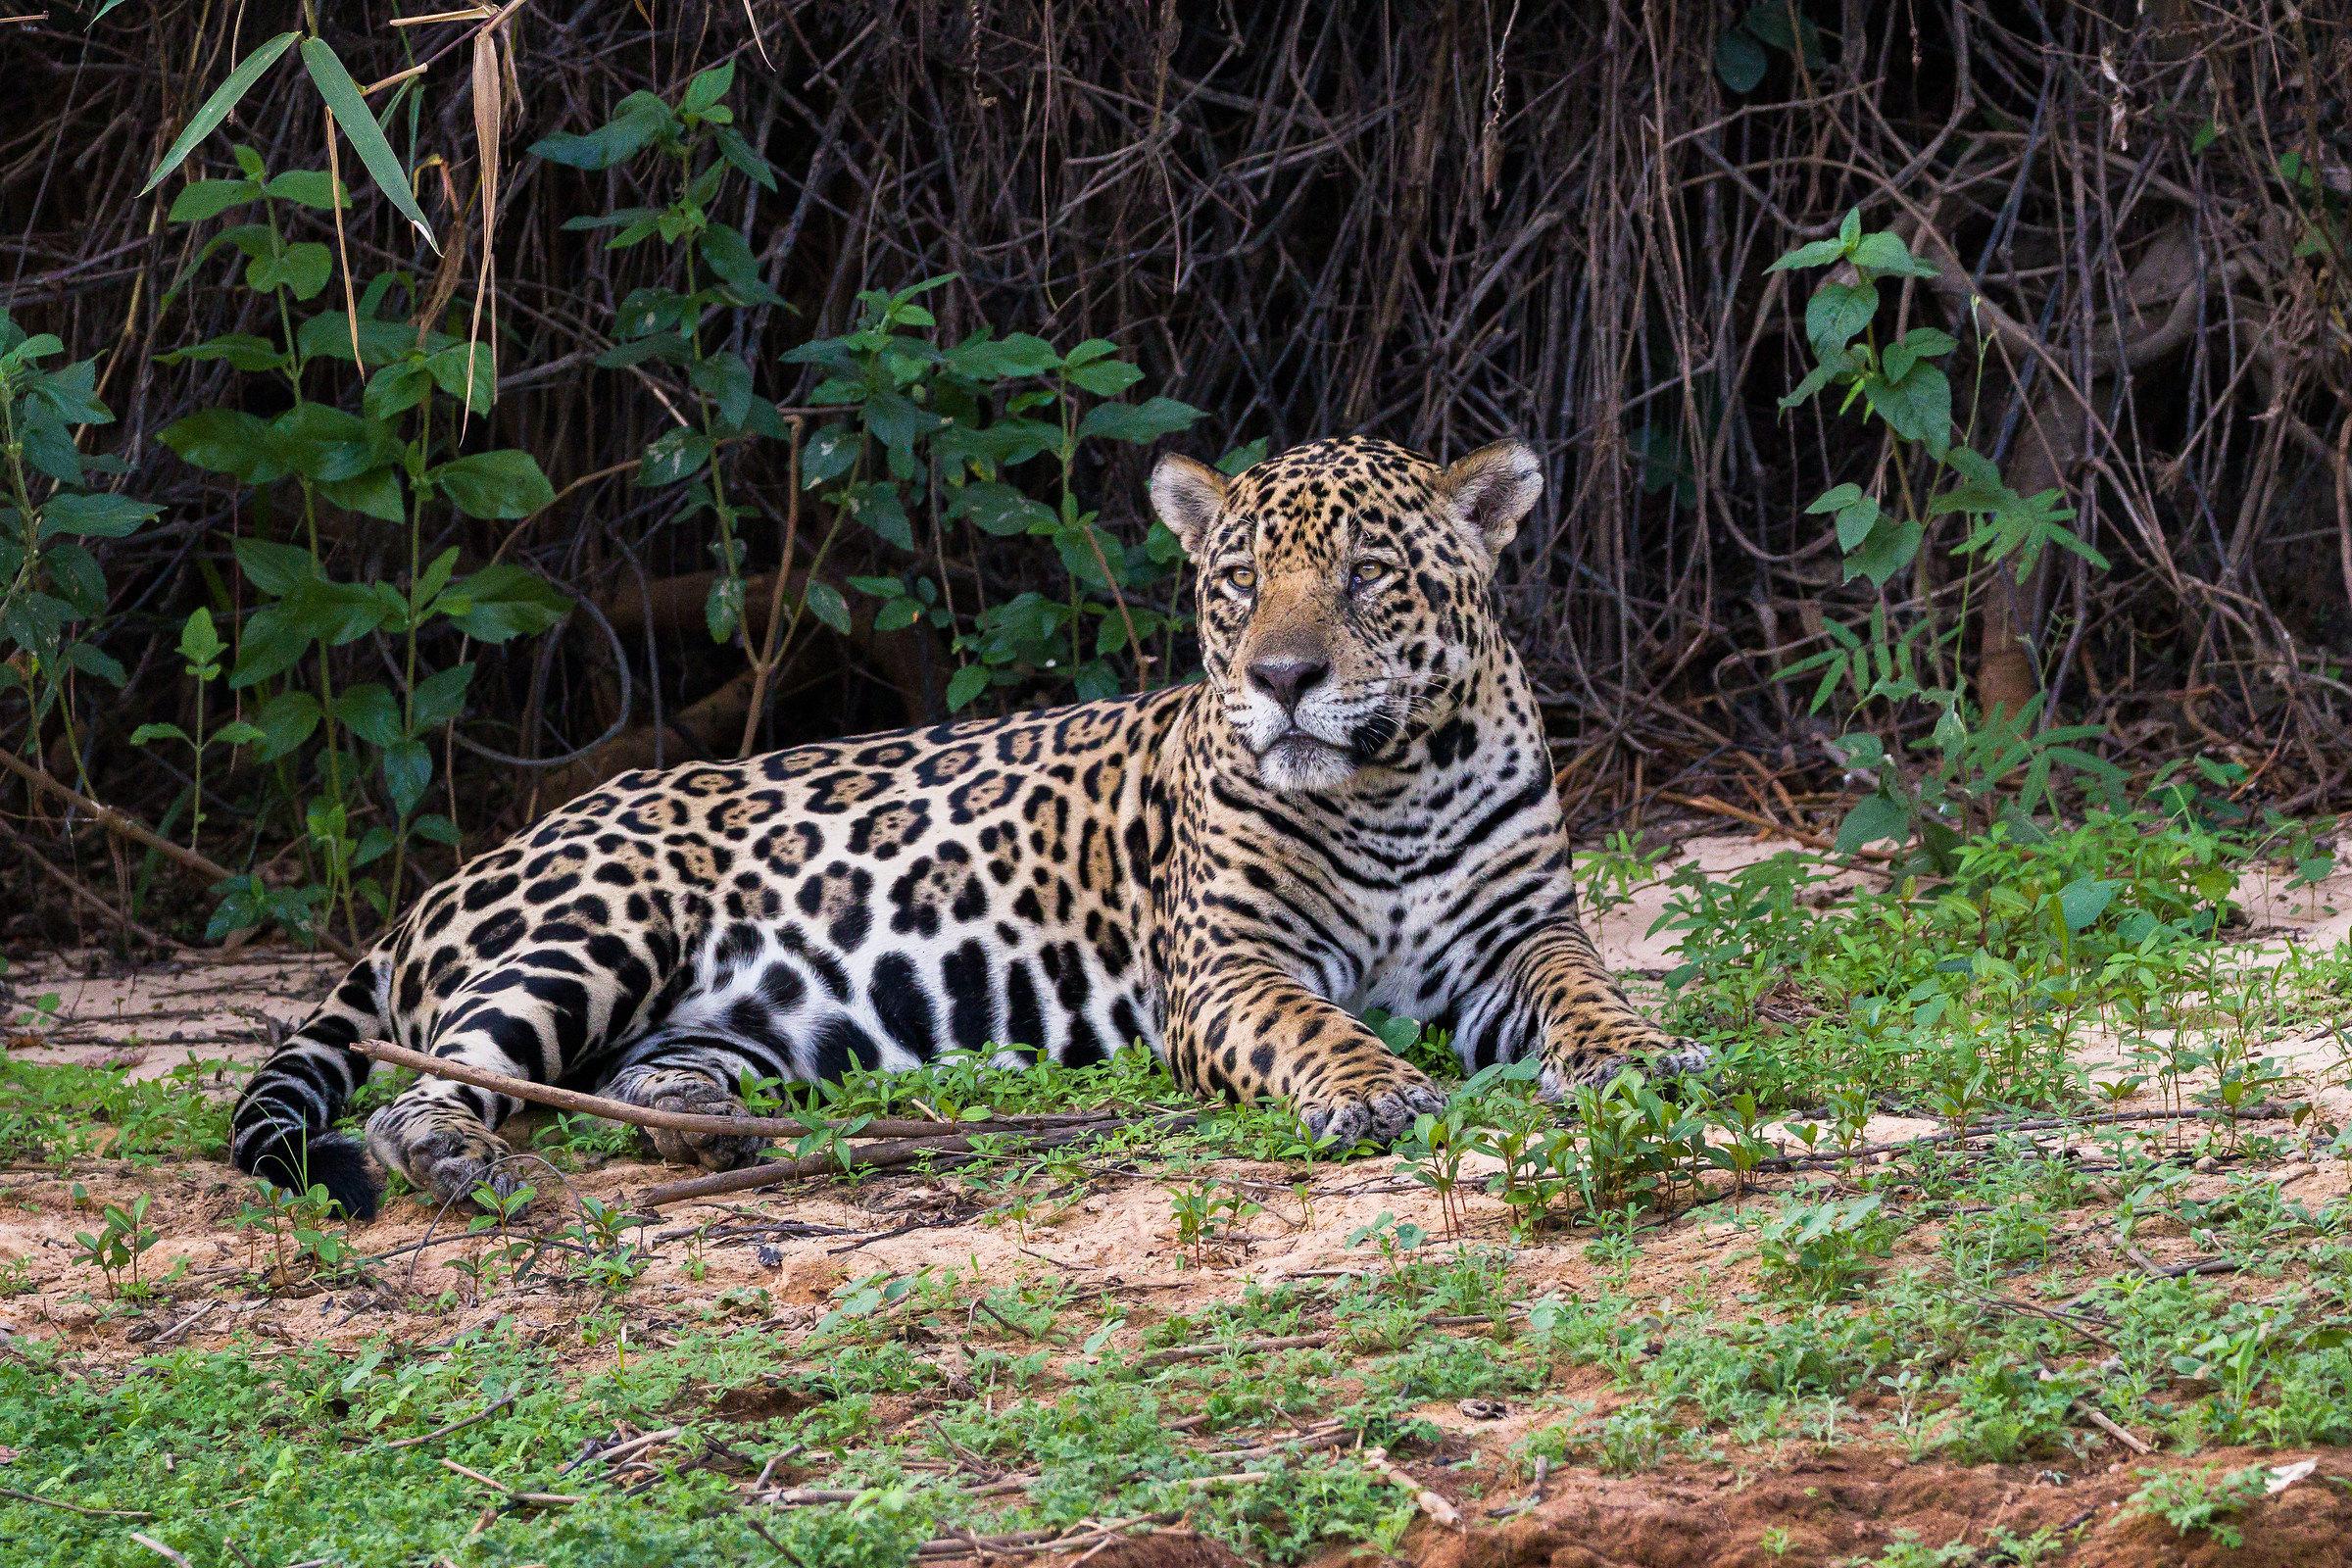 The dominant Jaguar...